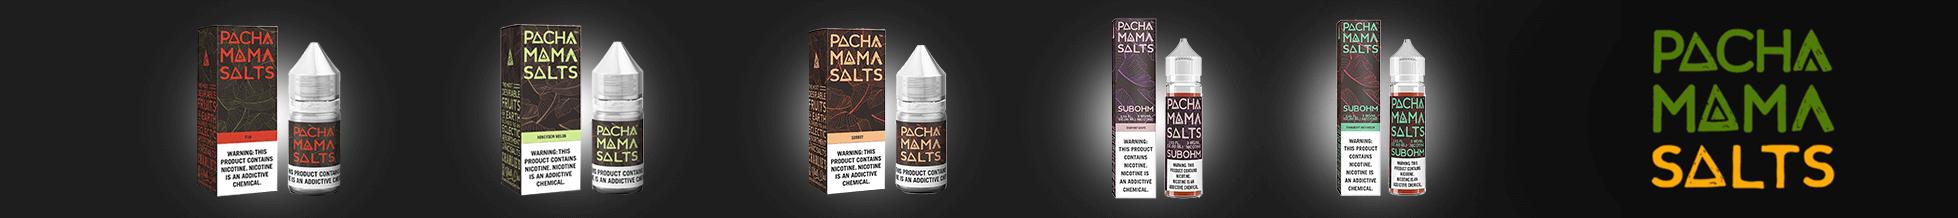 pacha-mama-salts-category.png